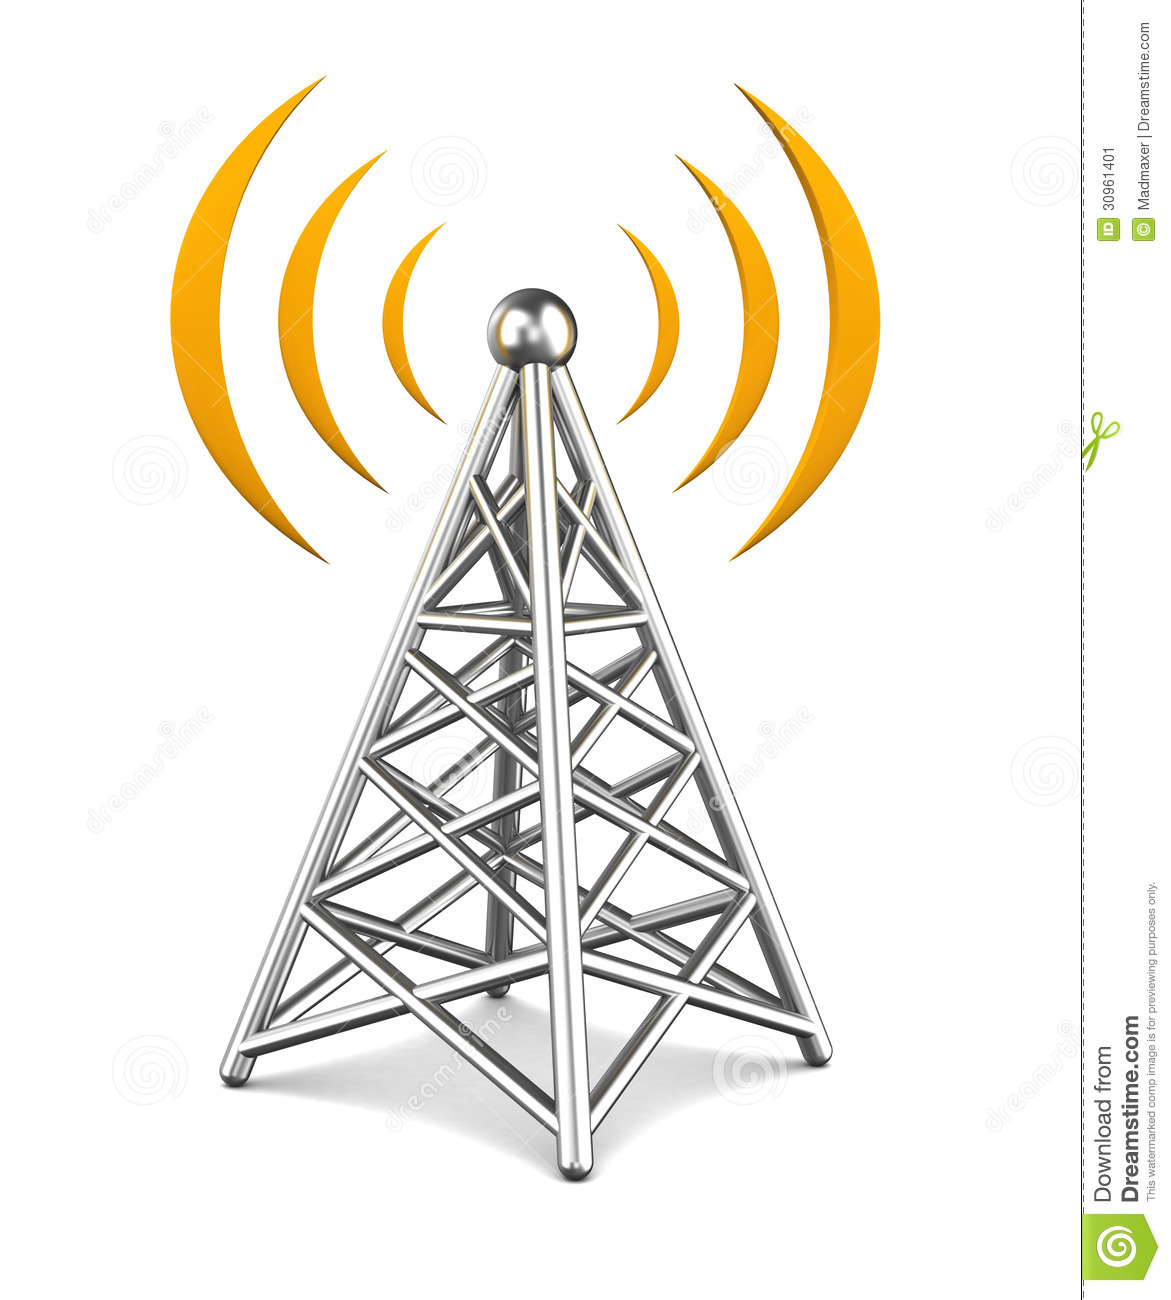 Radio Tower Clip Art Vector Communicatio-Radio Tower Clip Art Vector Communication Tower-6